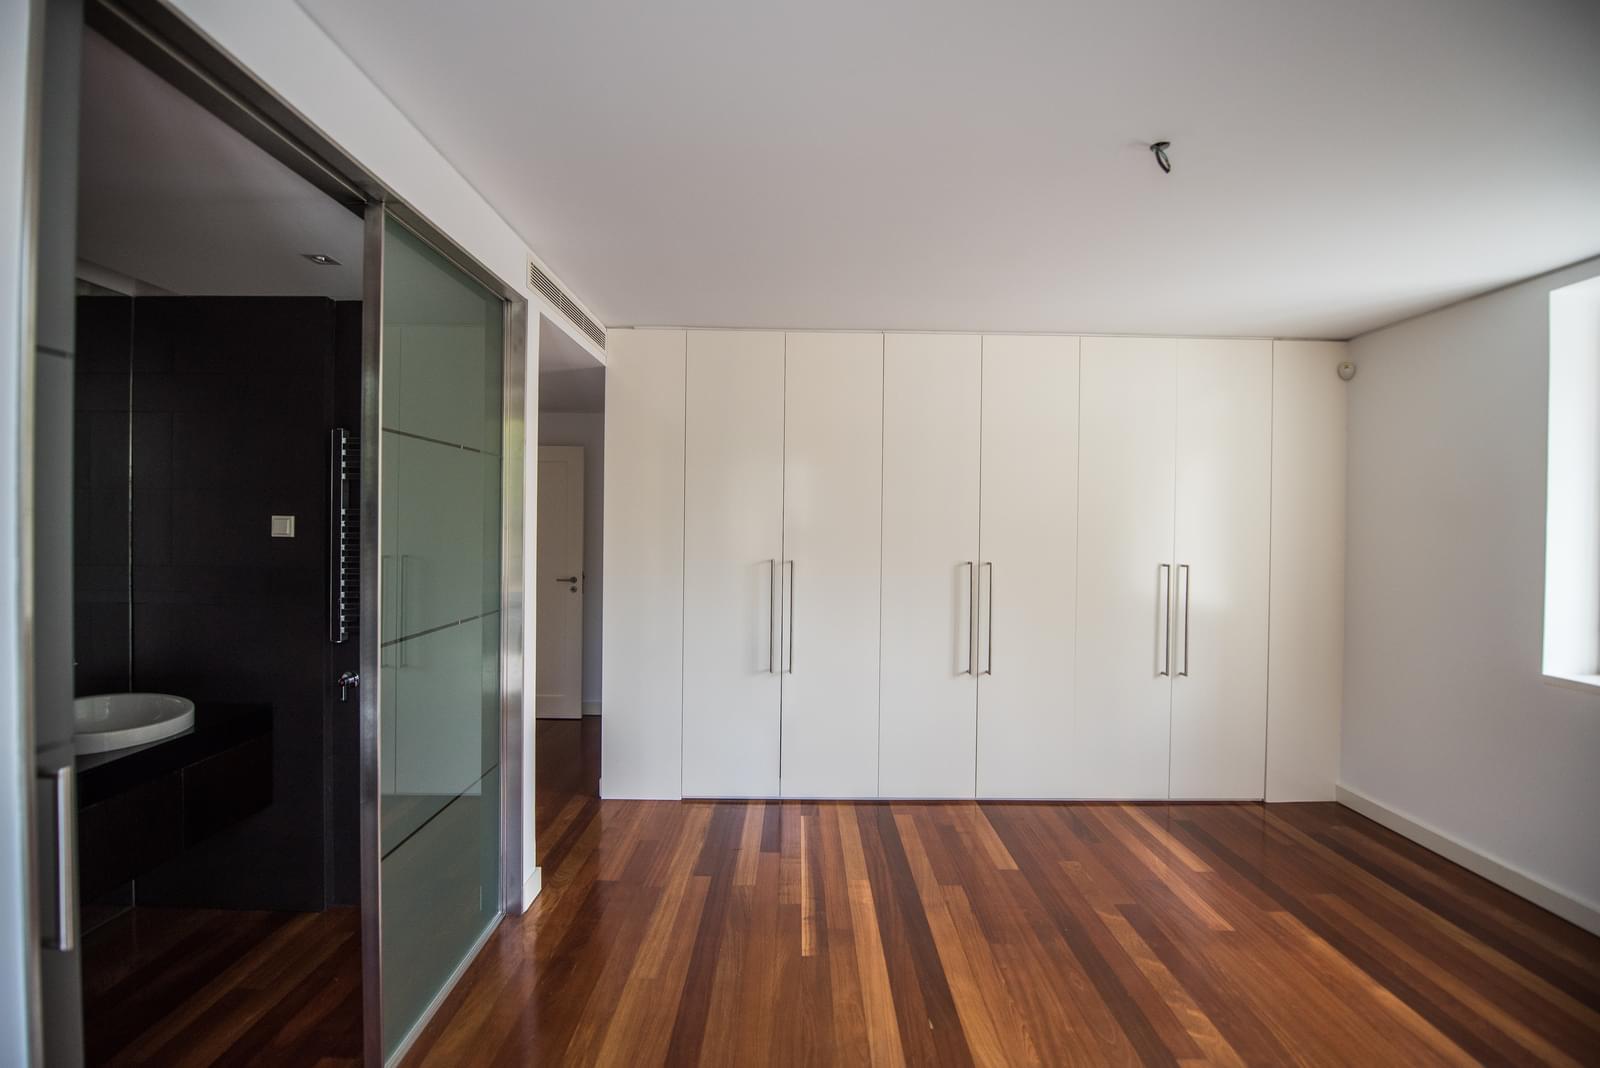 pf19211-apartamento-t4-lisboa-a4ed48be-d2de-4c82-a258-28aff67a336c